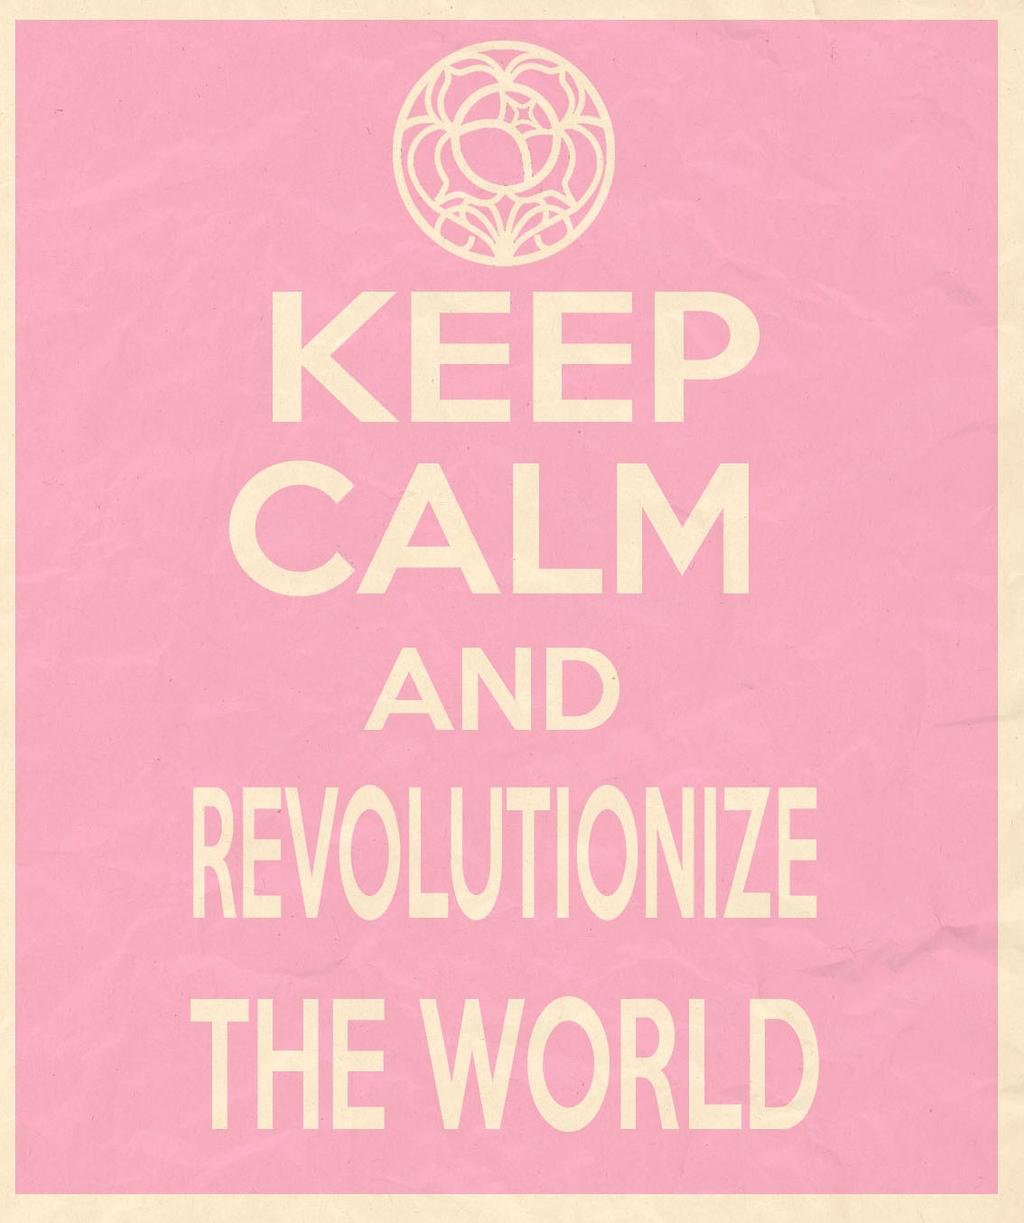 Keep calm and revolutionize the world by MizakiShidou